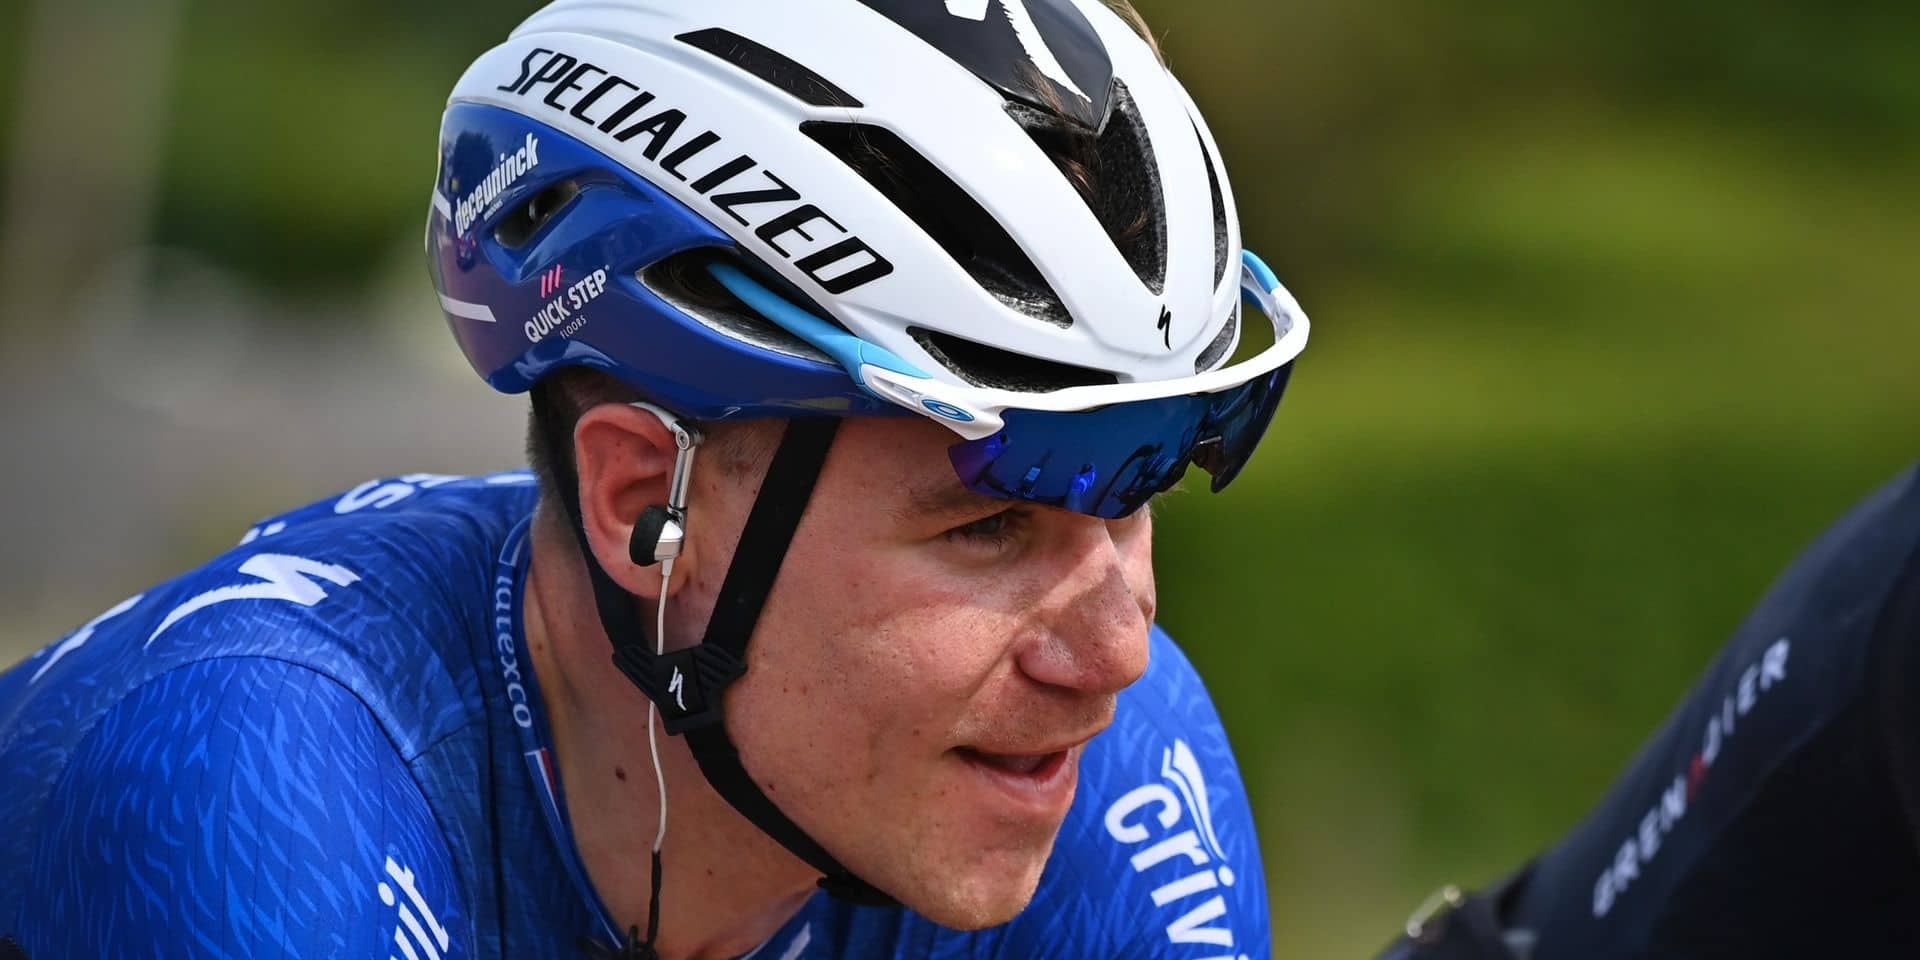 Fabio Jakobsen prolonge avec Deceuninck-Quick Step jusqu'en 2023